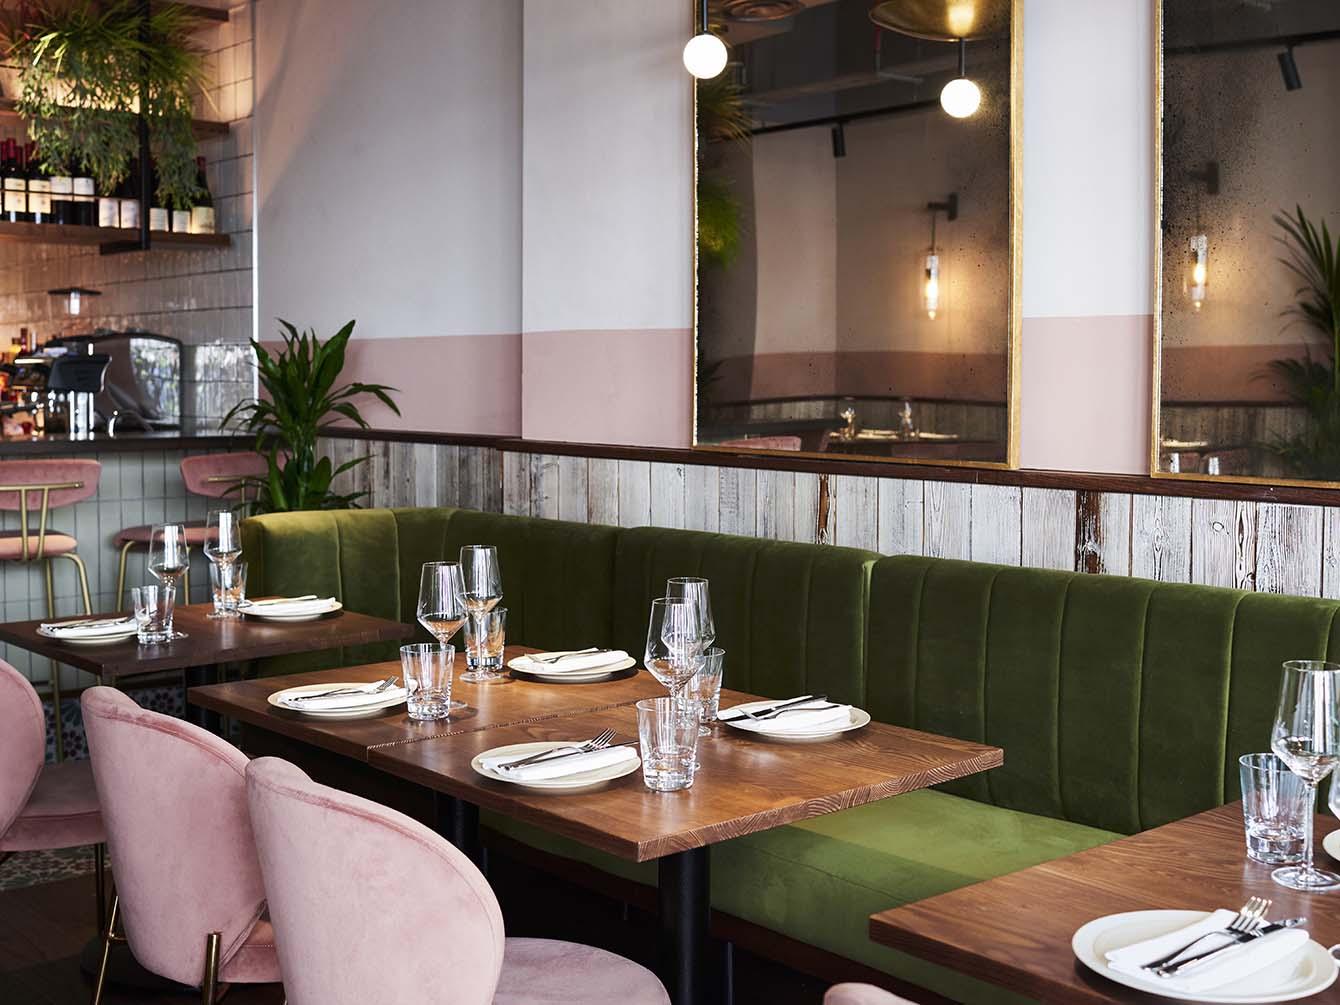 Nutshell Covent Garden, London, St. Martin's Lane Iranian Restaurant